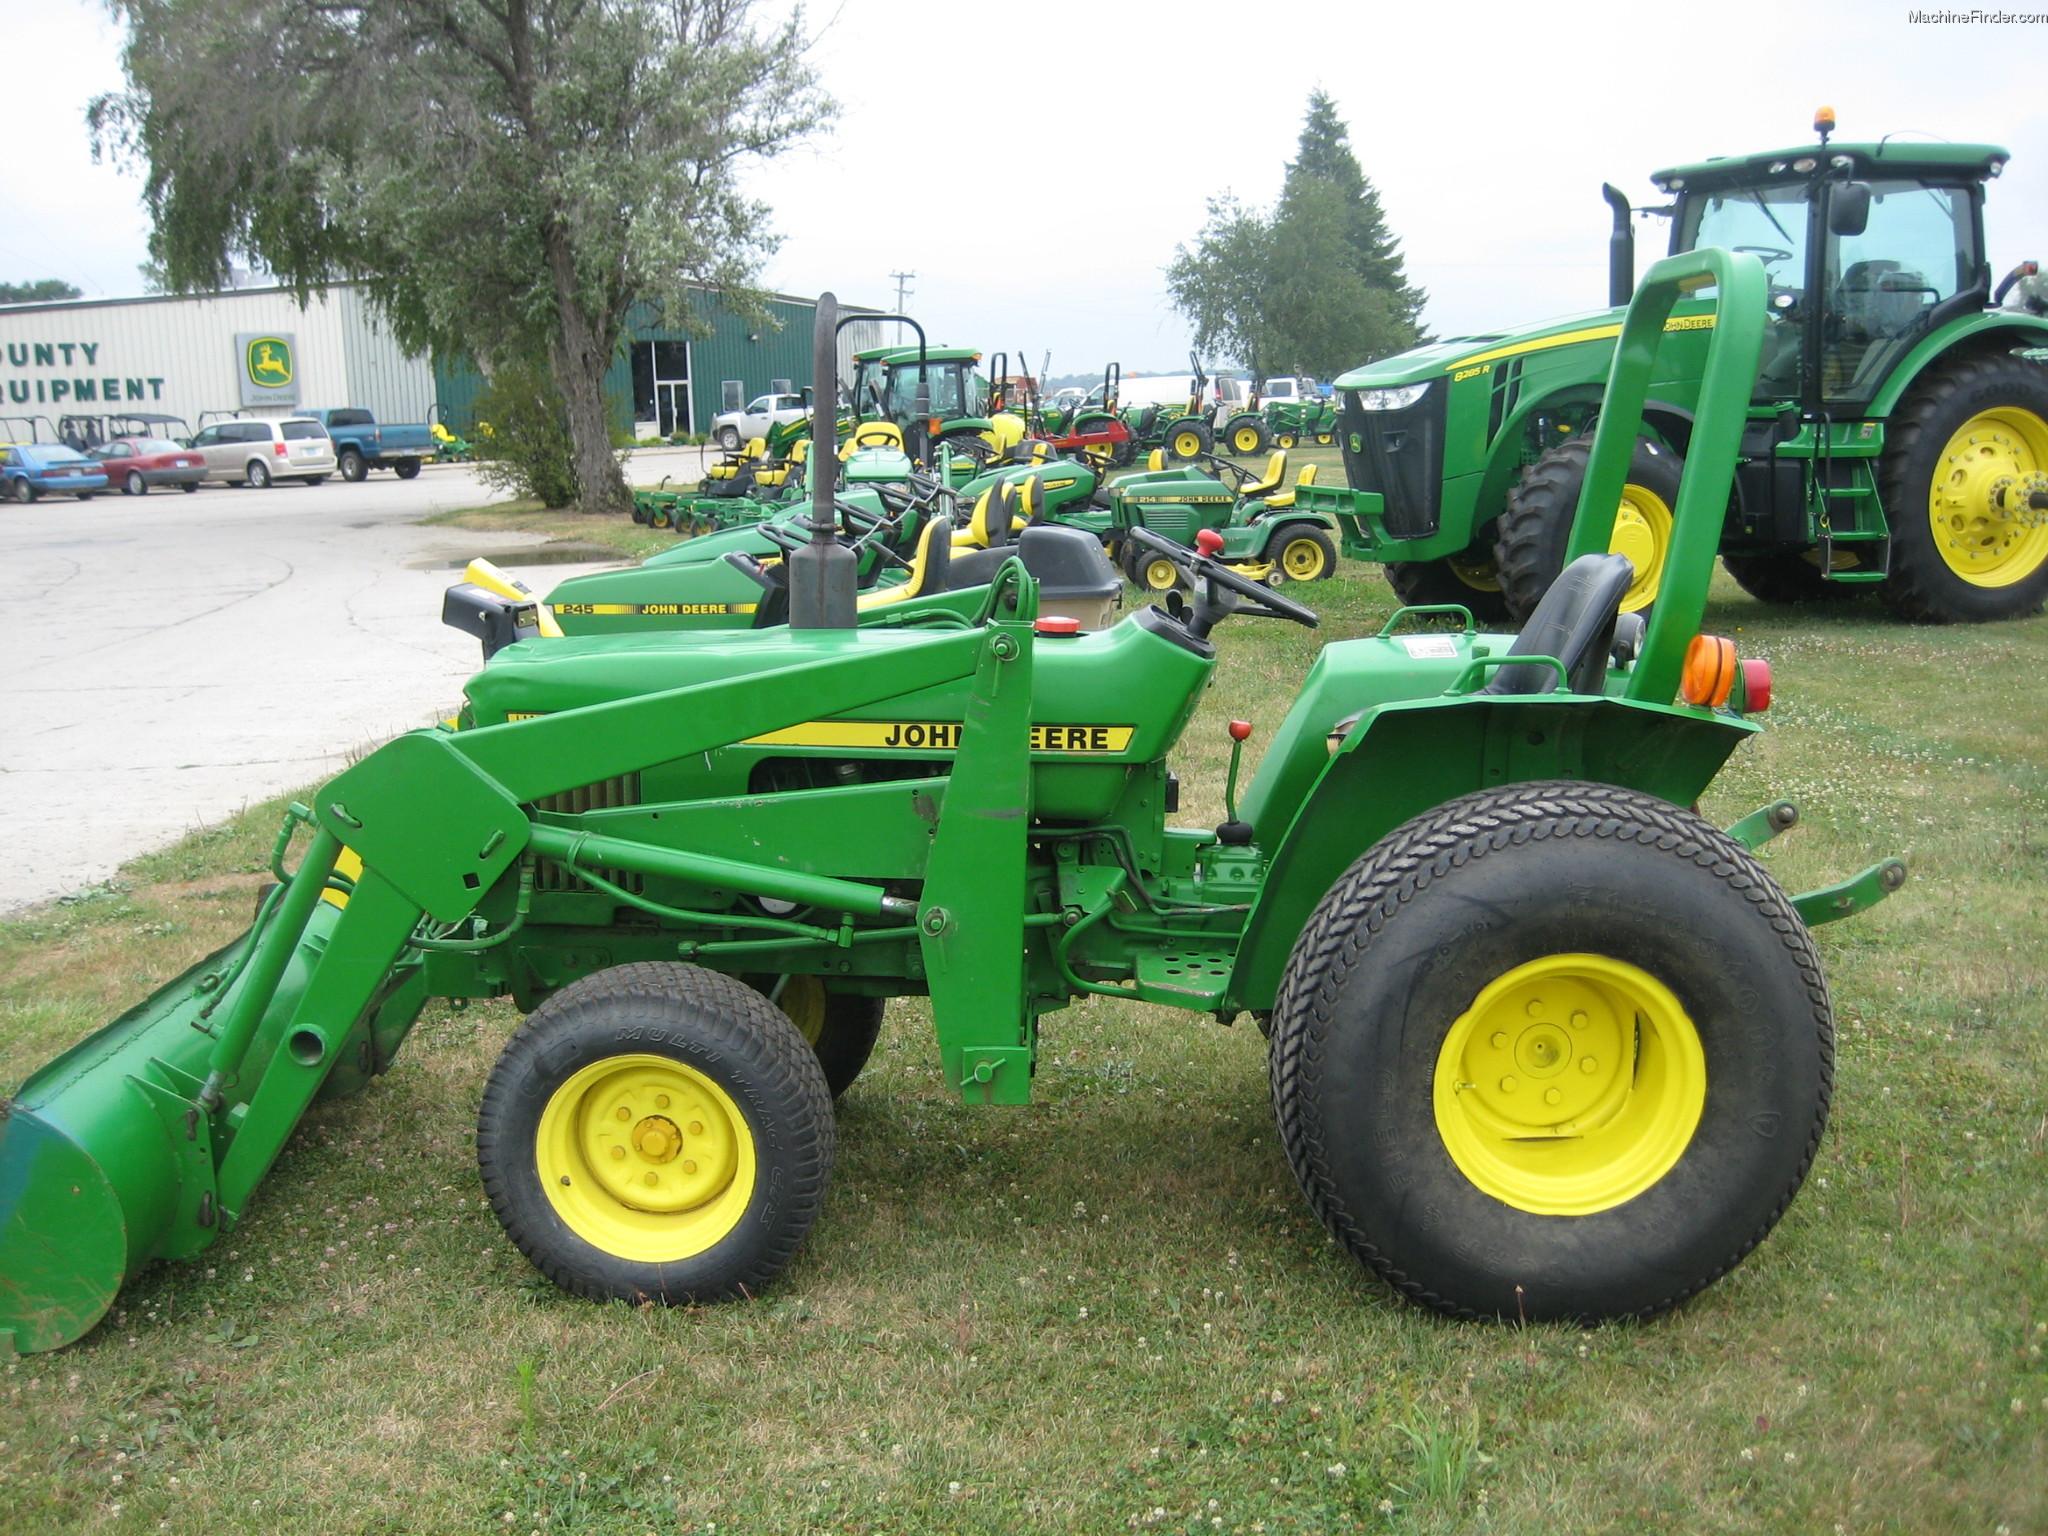 1984 John Deere 750 Tractors - Compact (1-40hp.) - John ...